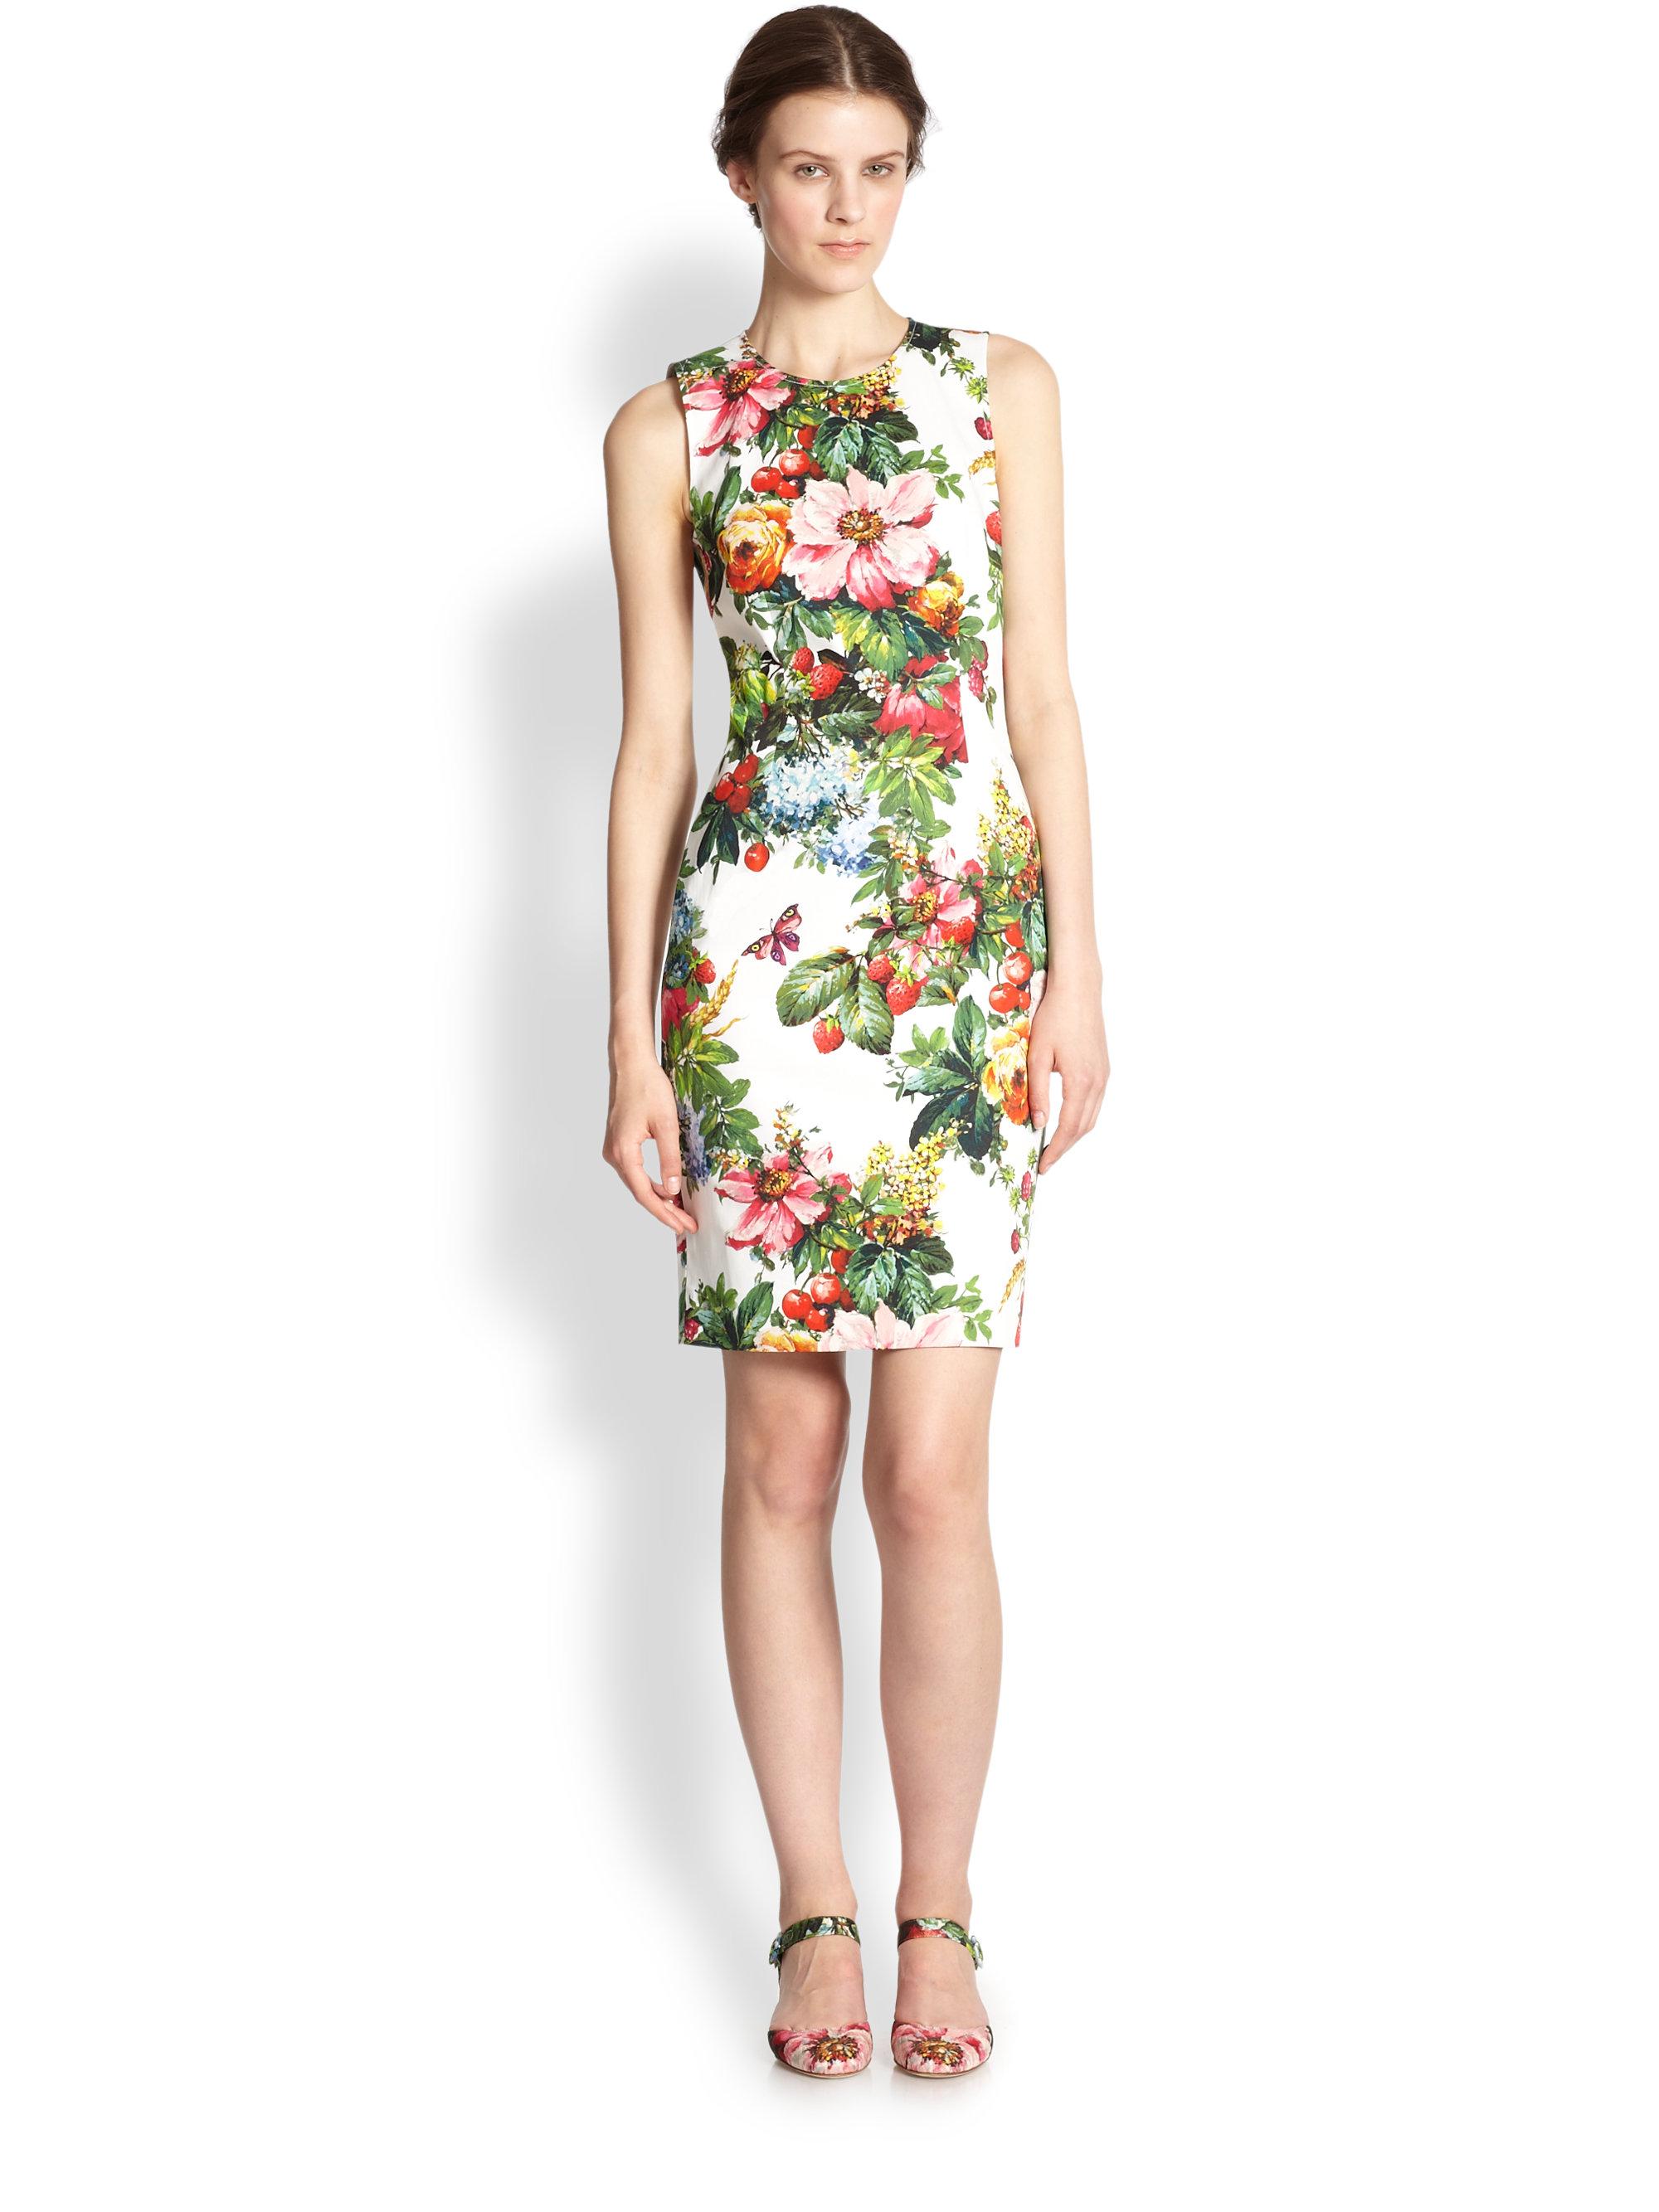 c6d1a2f86ba Dolce   Gabbana Floral print Stretch Cotton Dress - Lyst